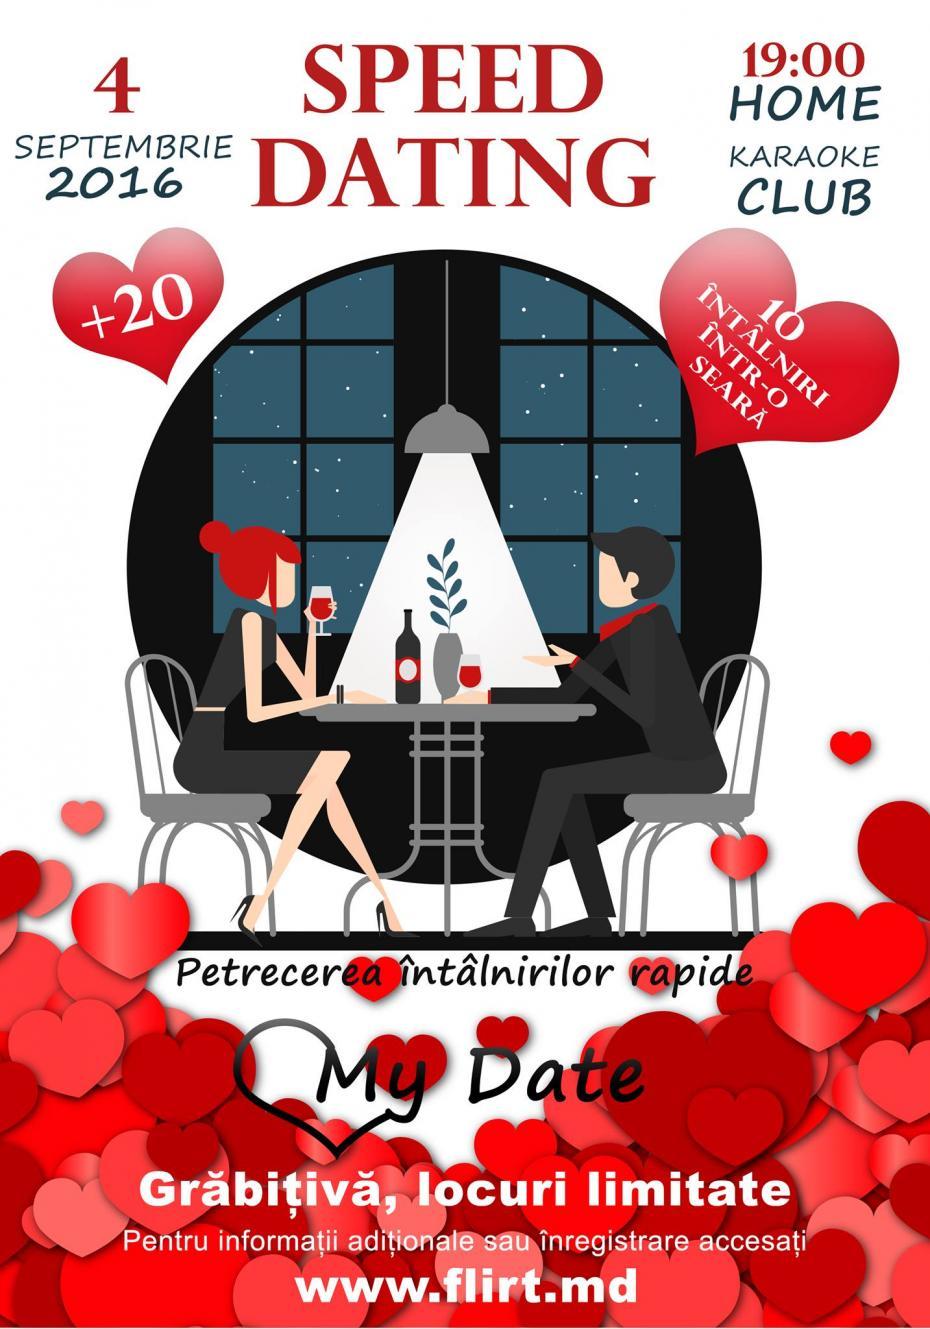 homoseksuelle dating sites mumbai